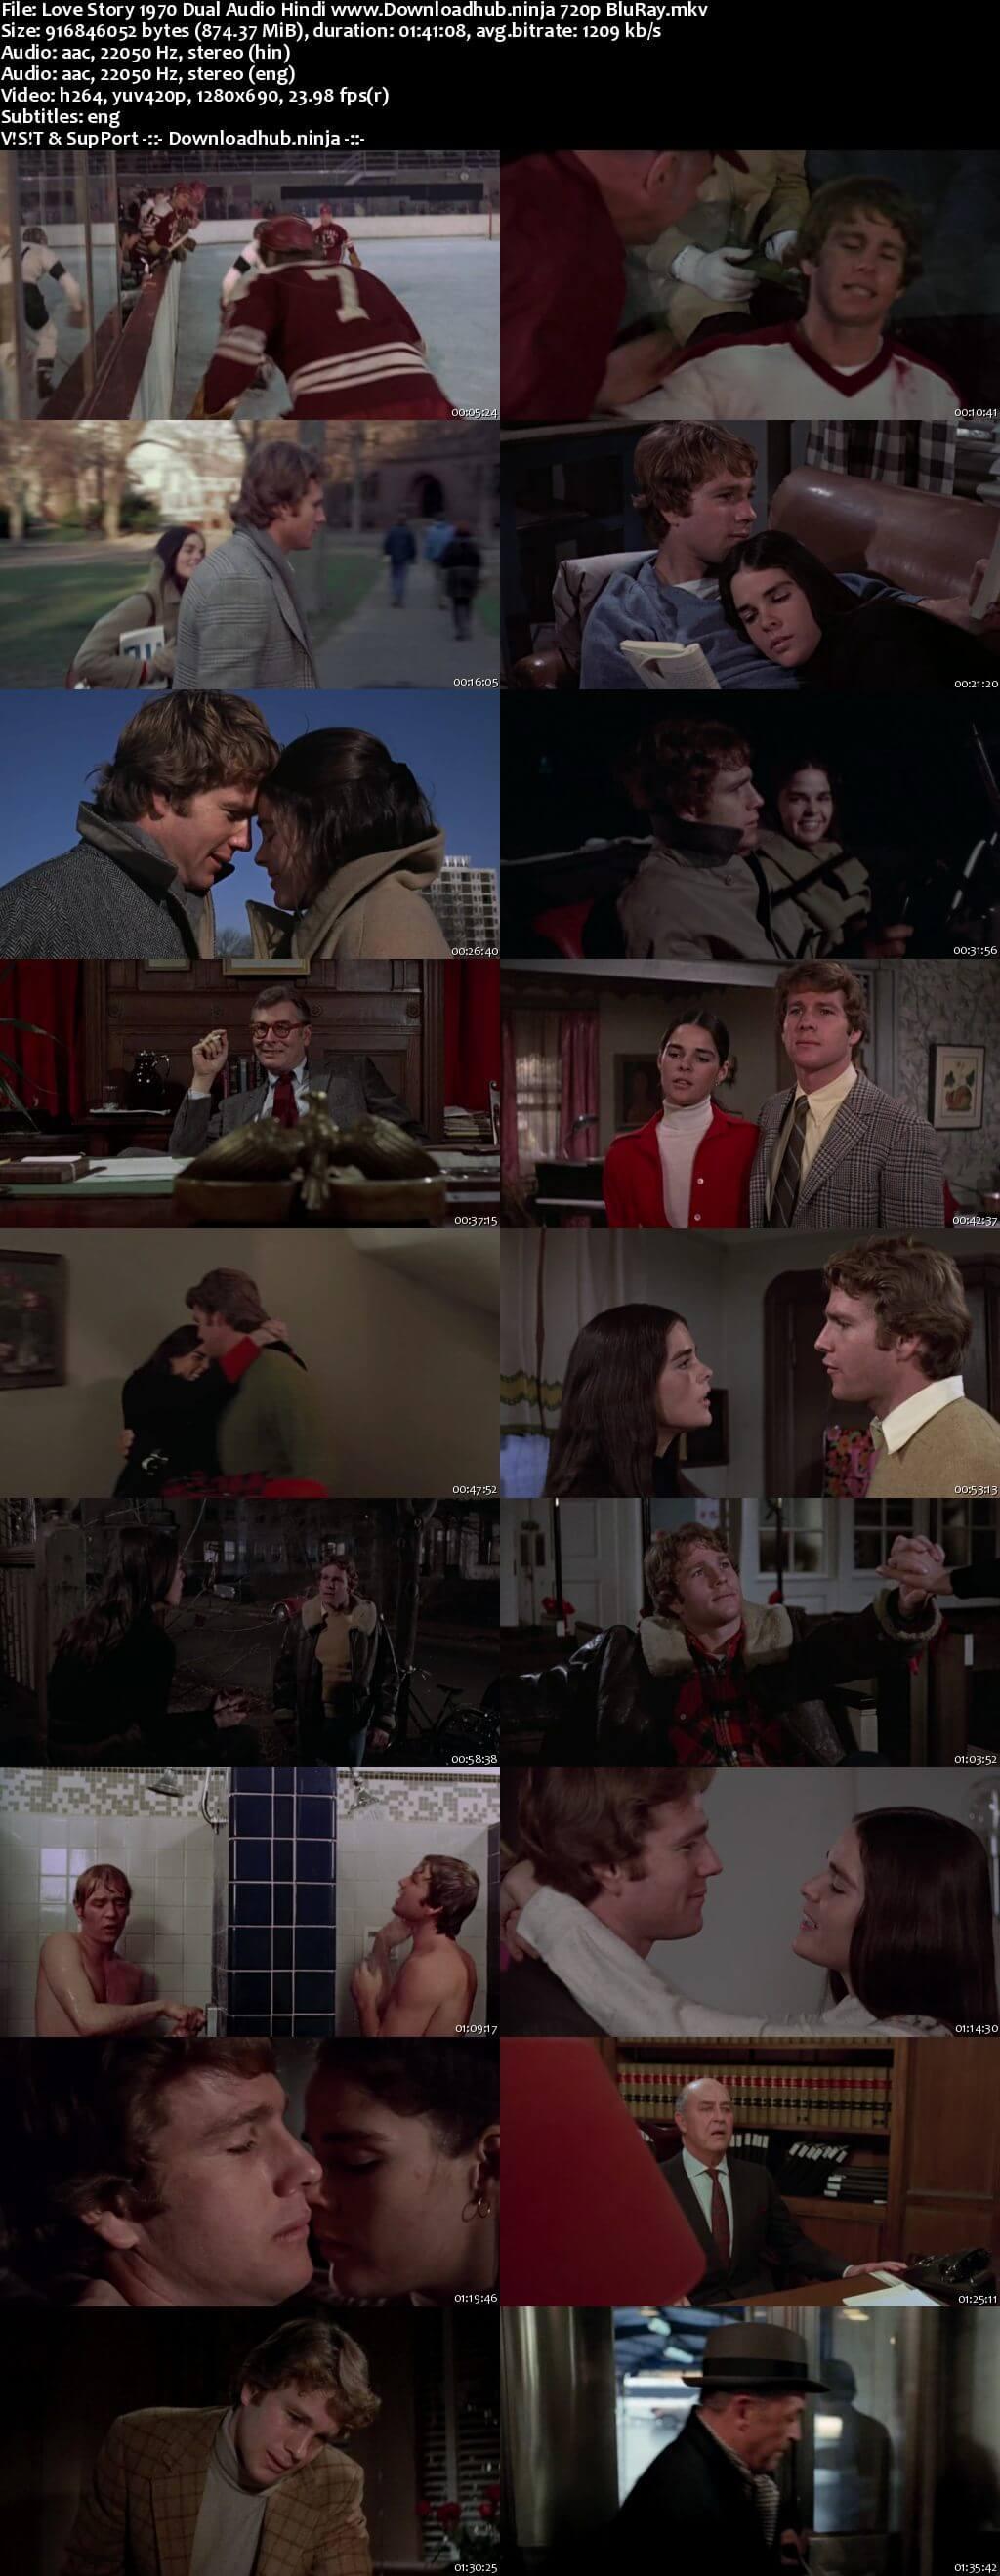 Love Story 1970 Hindi Dual Audio 720p BluRay ESubs